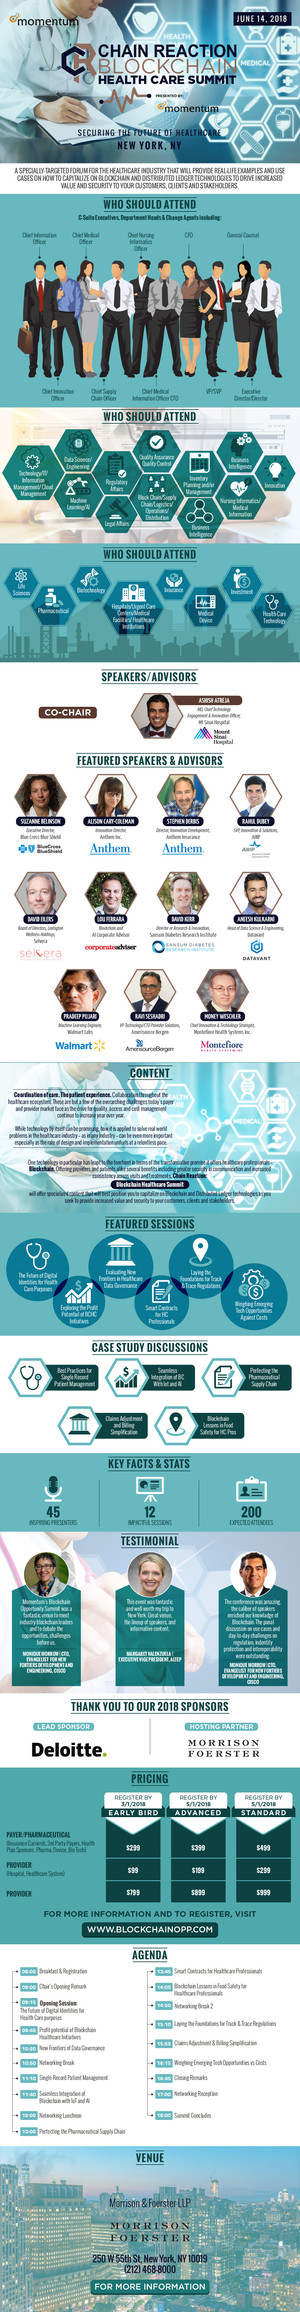 Chain Reaction Block Chain Health Care Summit